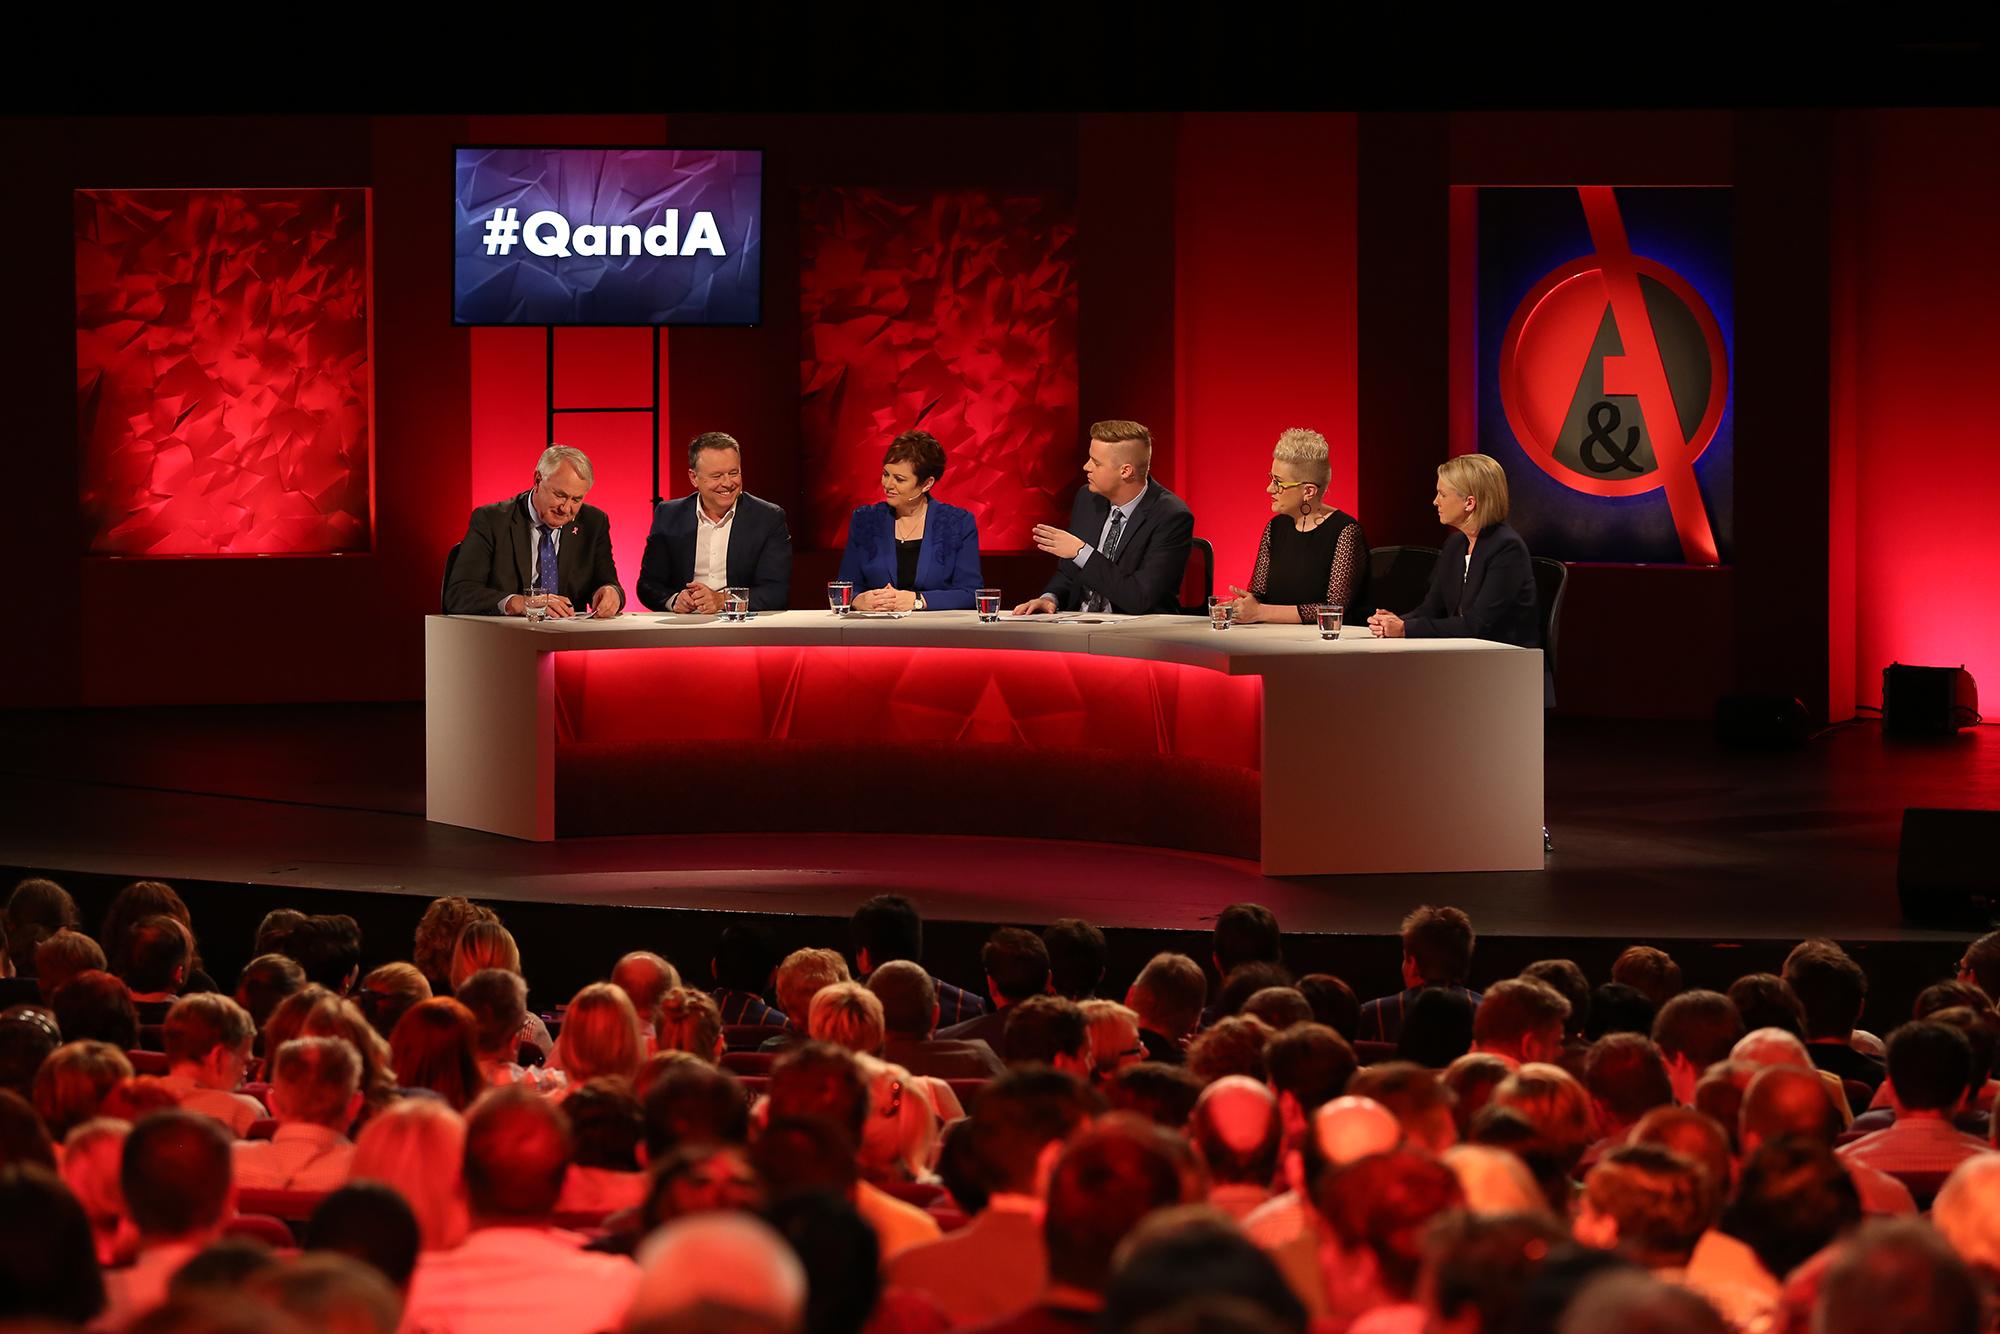 ABC's Q&A program, live in Toowoomba.